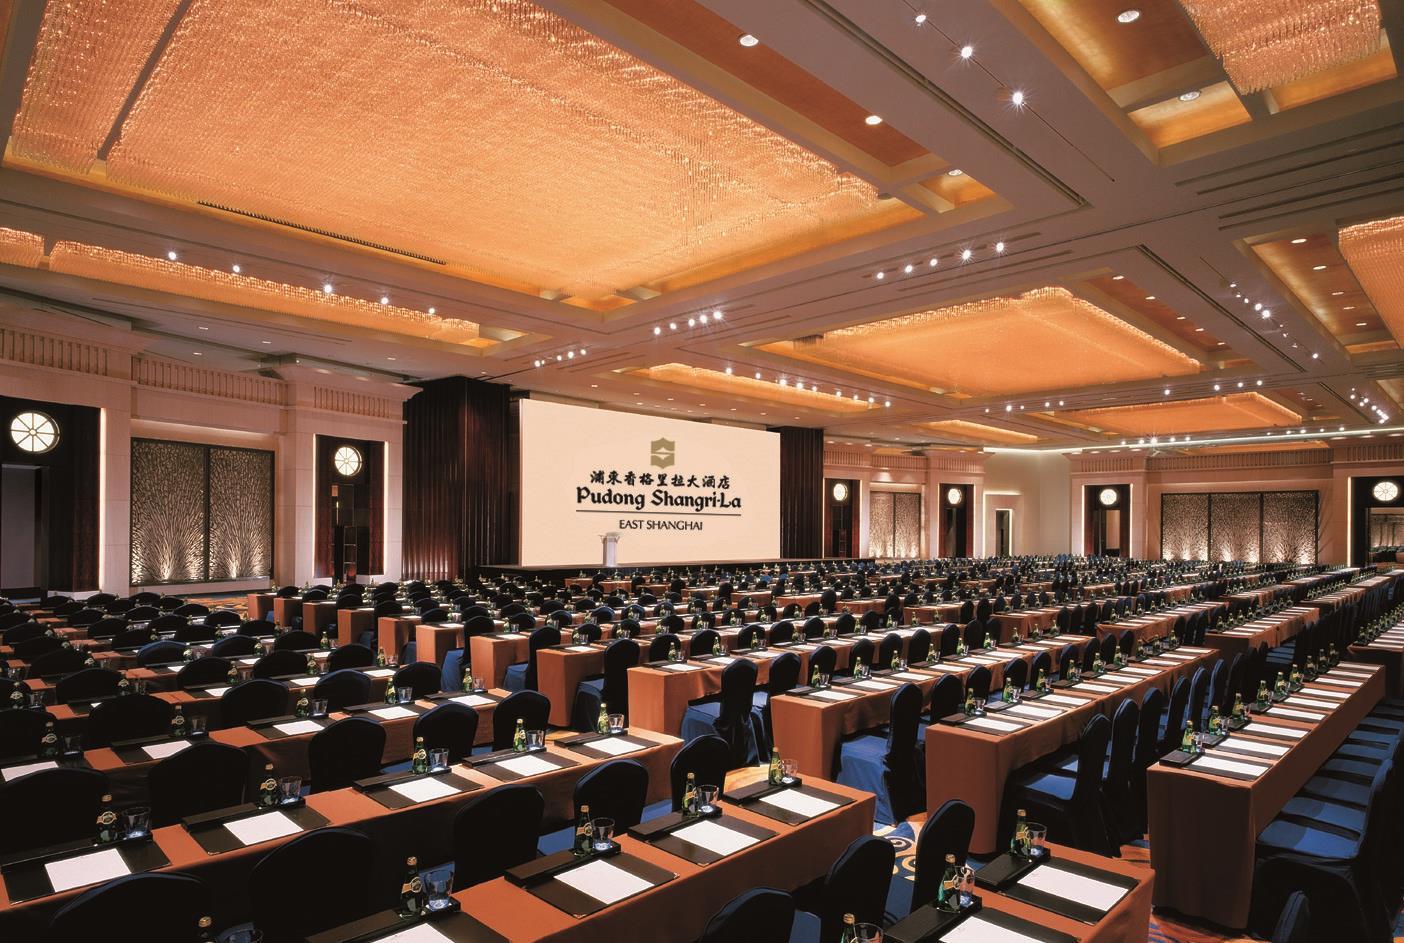 Meetings And Events At Pudong Shangri La Hotel Shanghai